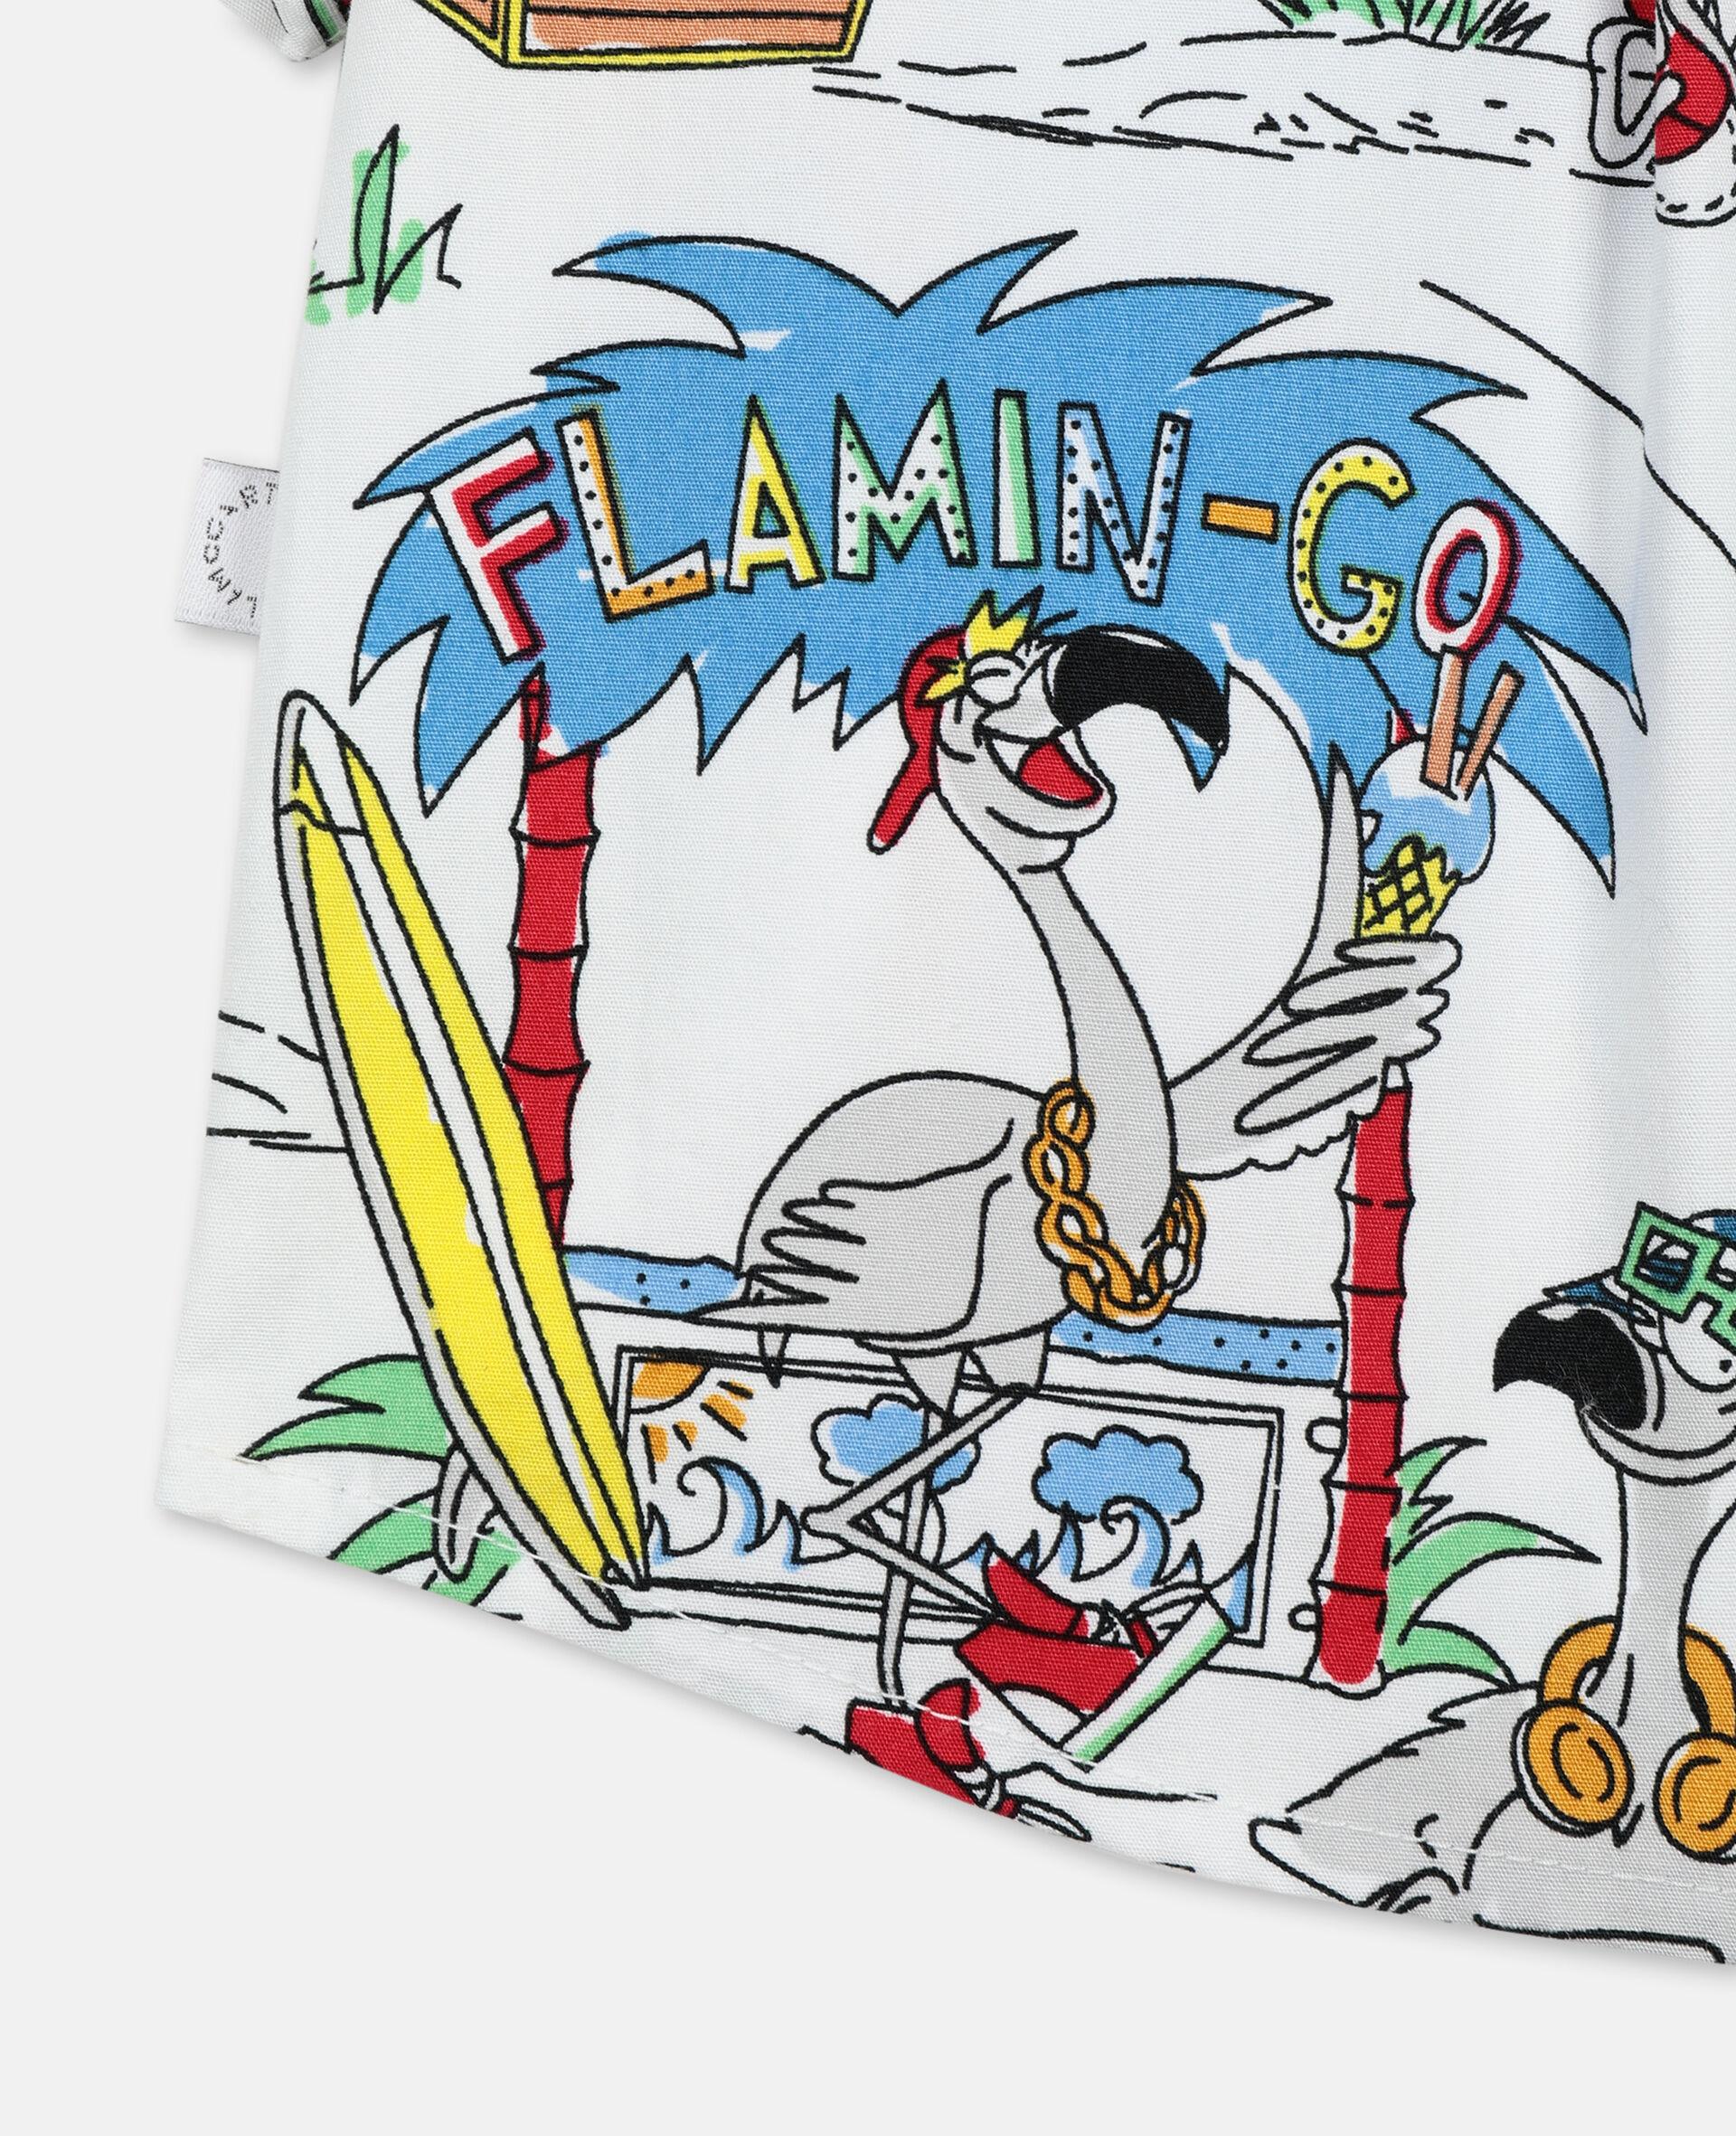 Flamingo Land Cotton Shirt -Multicolour-large image number 1